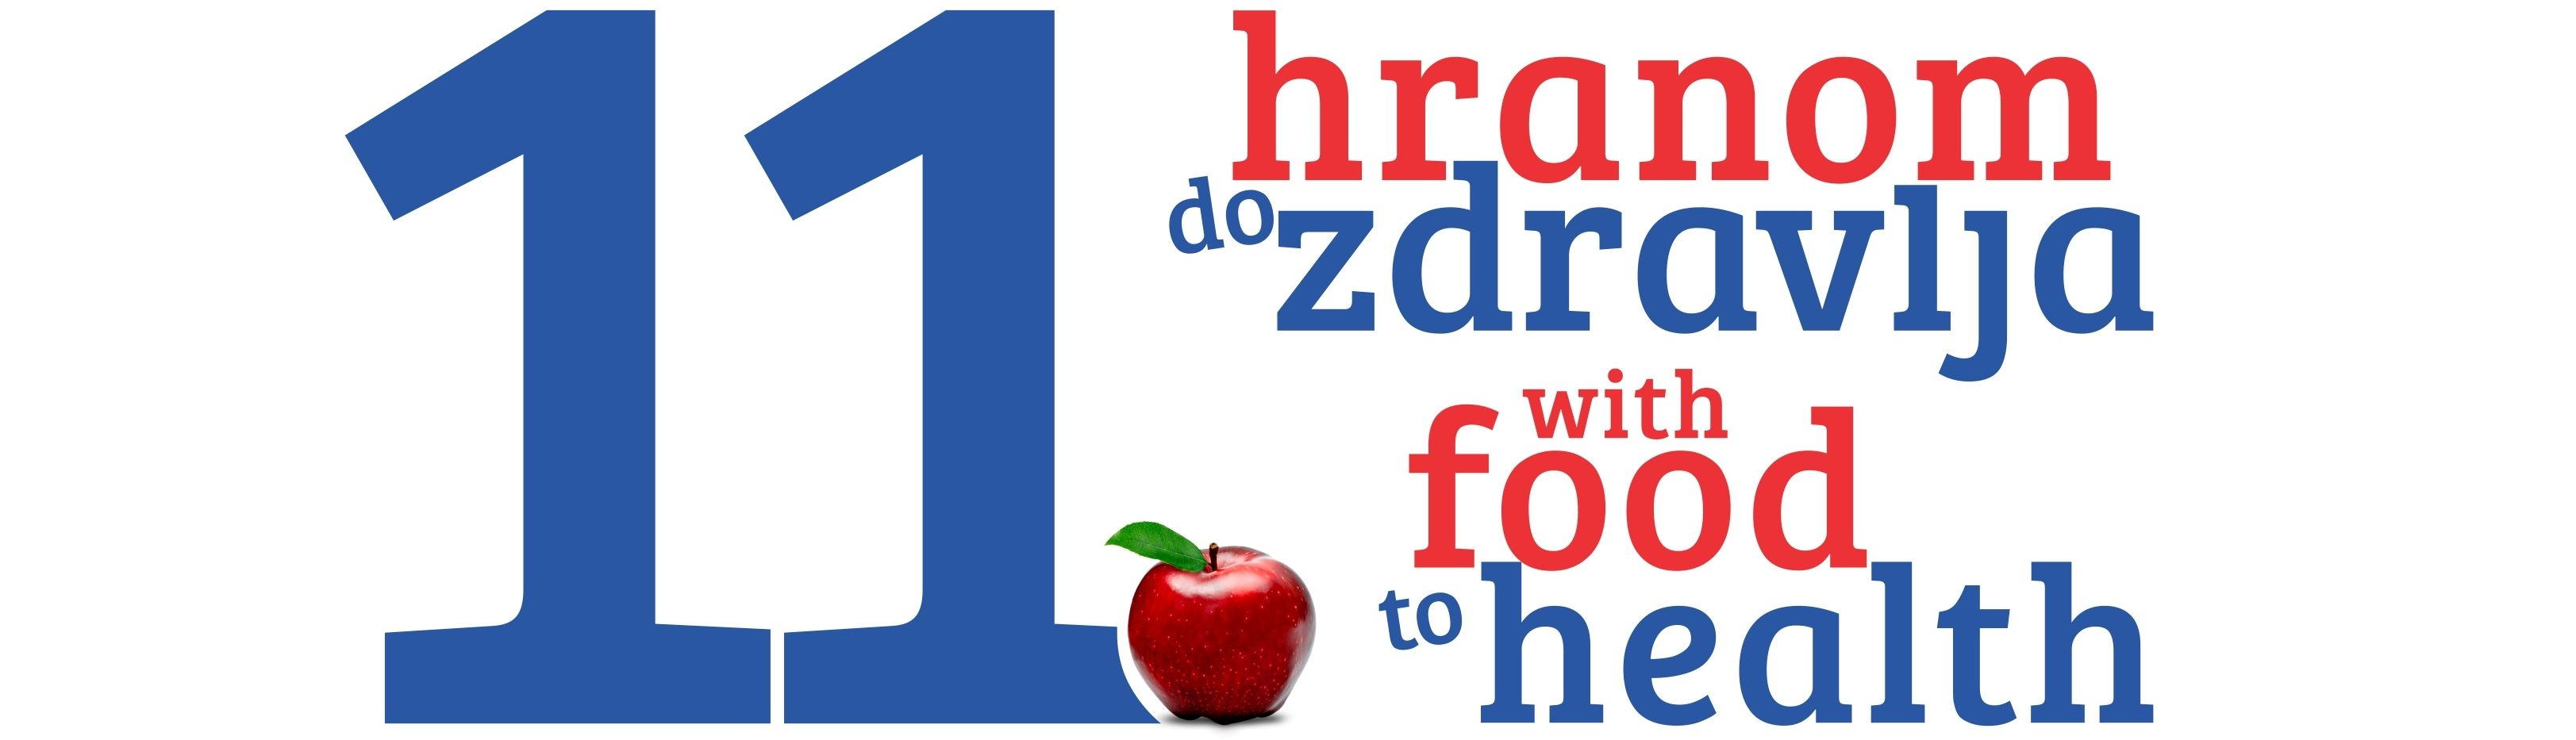 Hranom do zdravlja